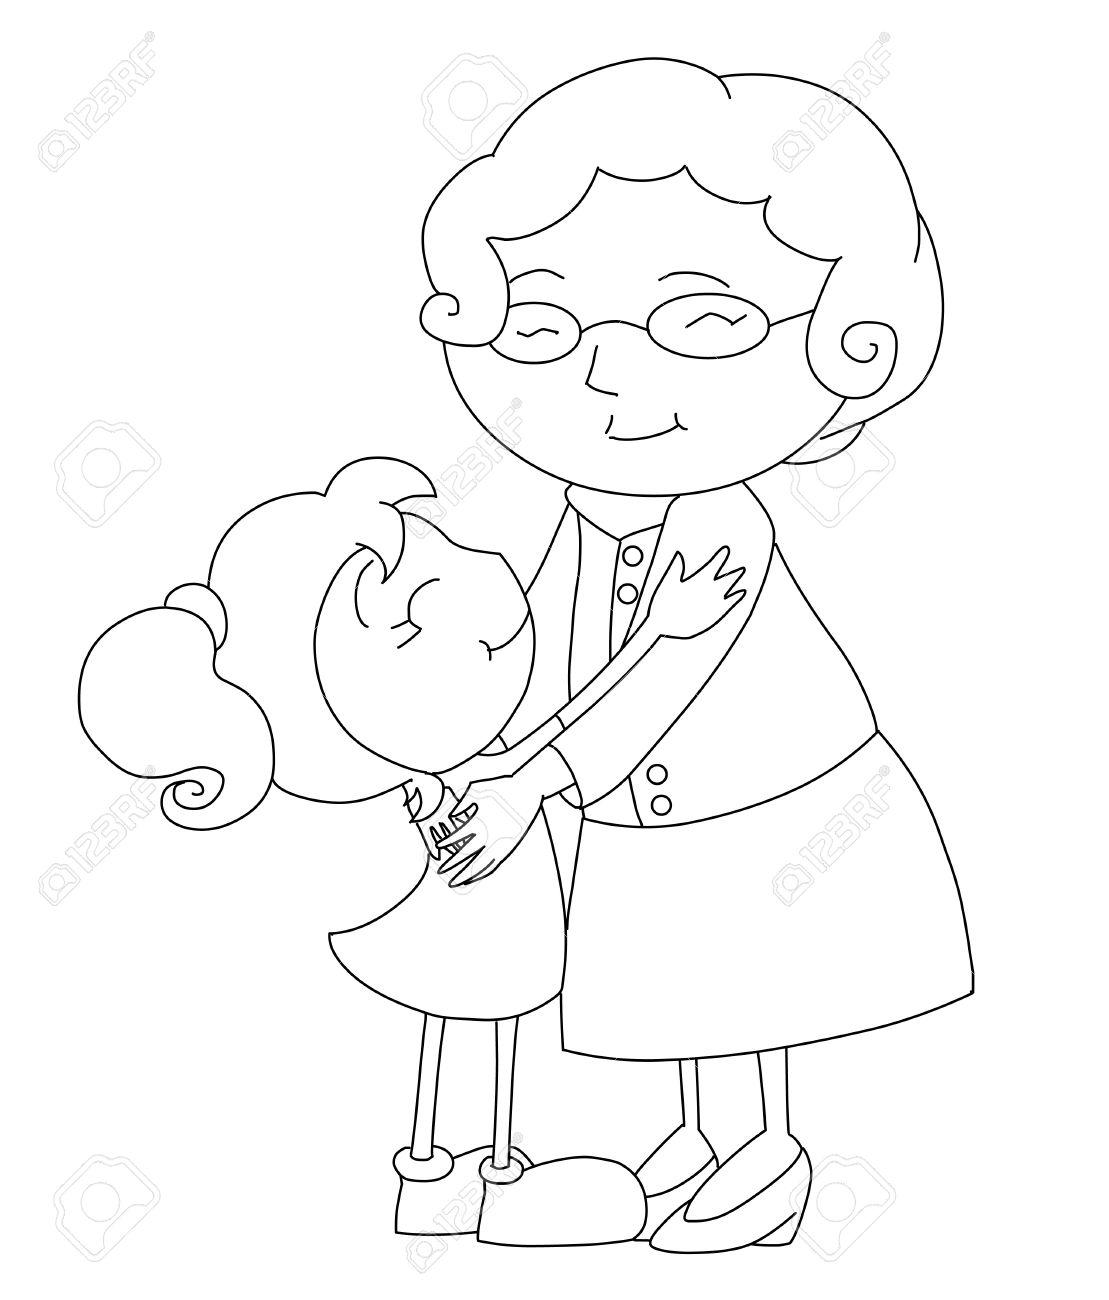 Grandma hugging grandchildren clipart black and white vector stock Grandma paintings search result at PaintingValley.com vector stock